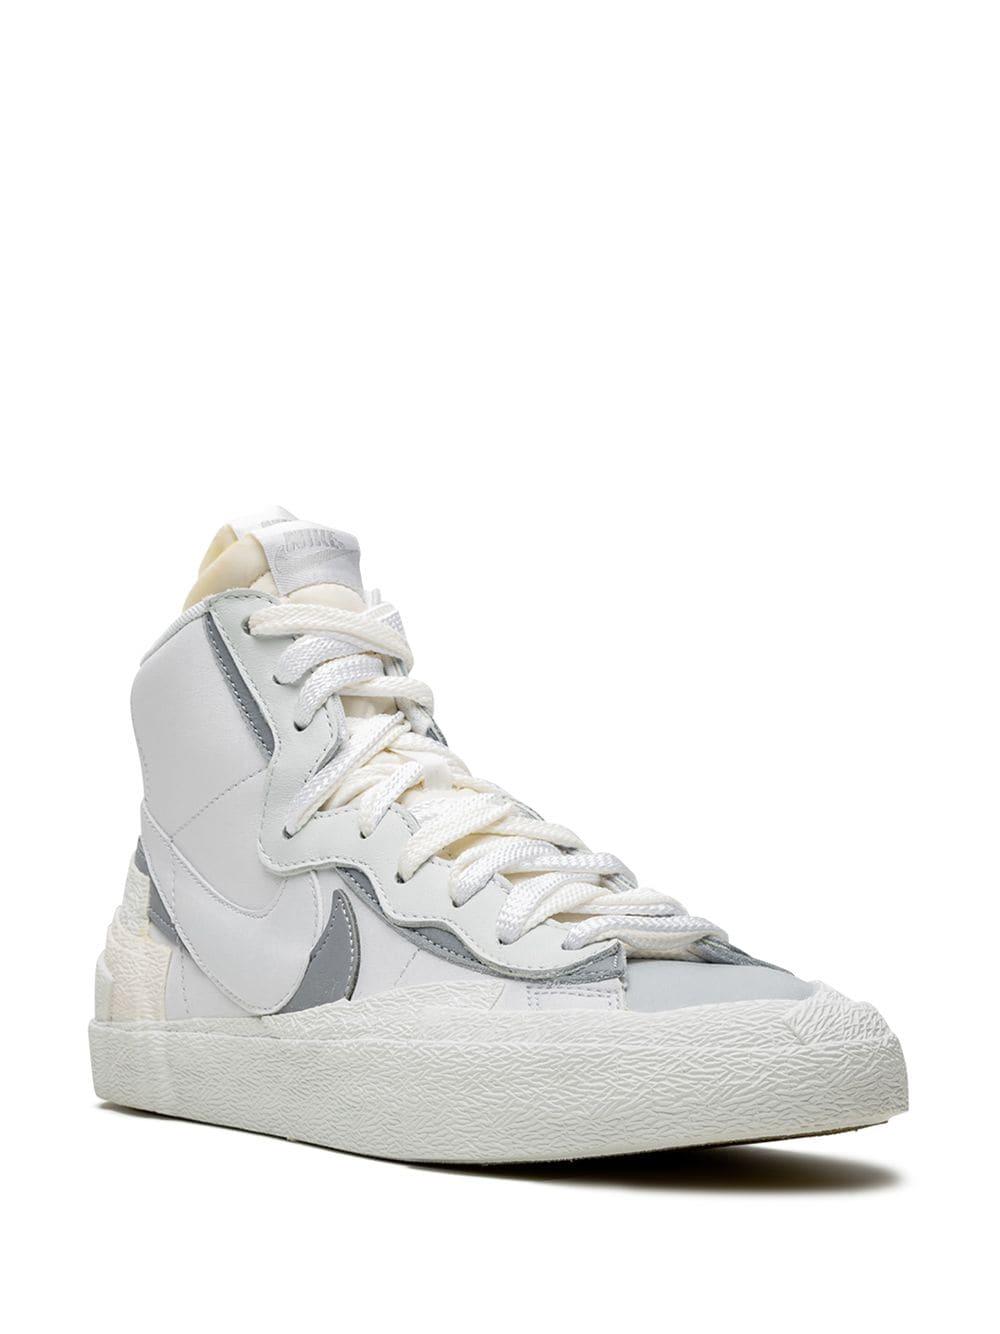 NIKE x Sacai Blazer Mid high-top sneakers, 573лв.